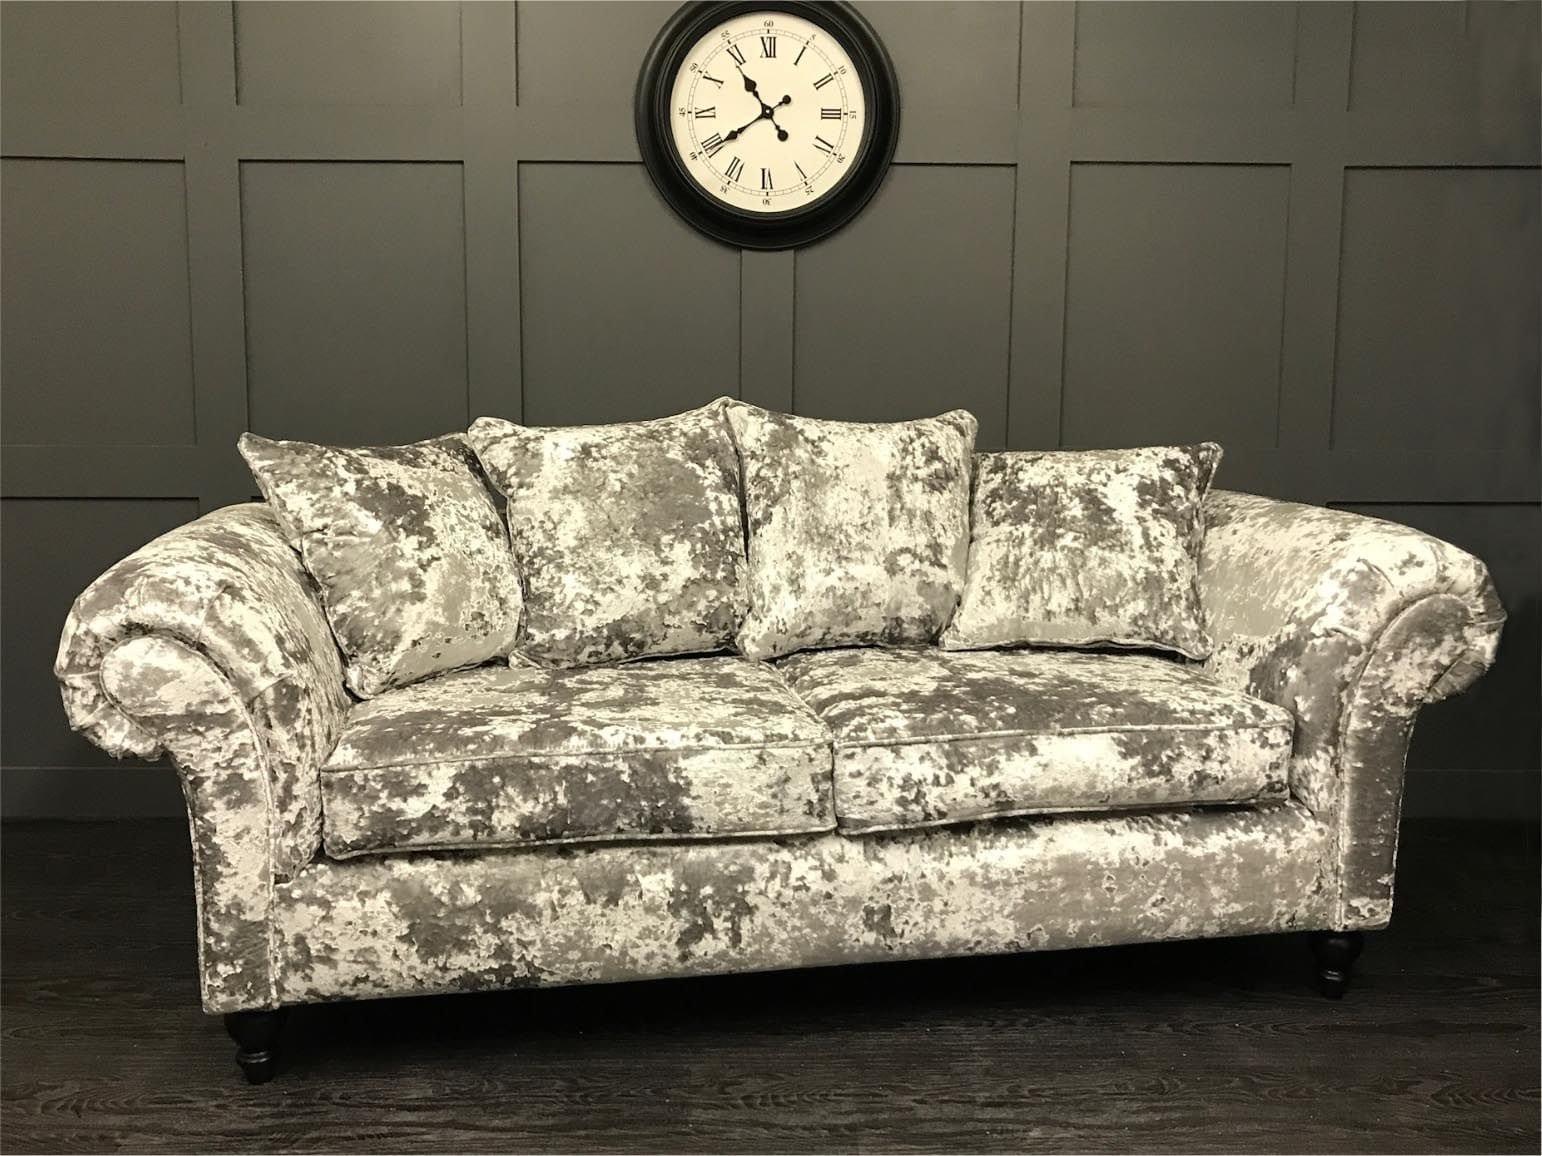 Lustro Argent Balmoral Sofa